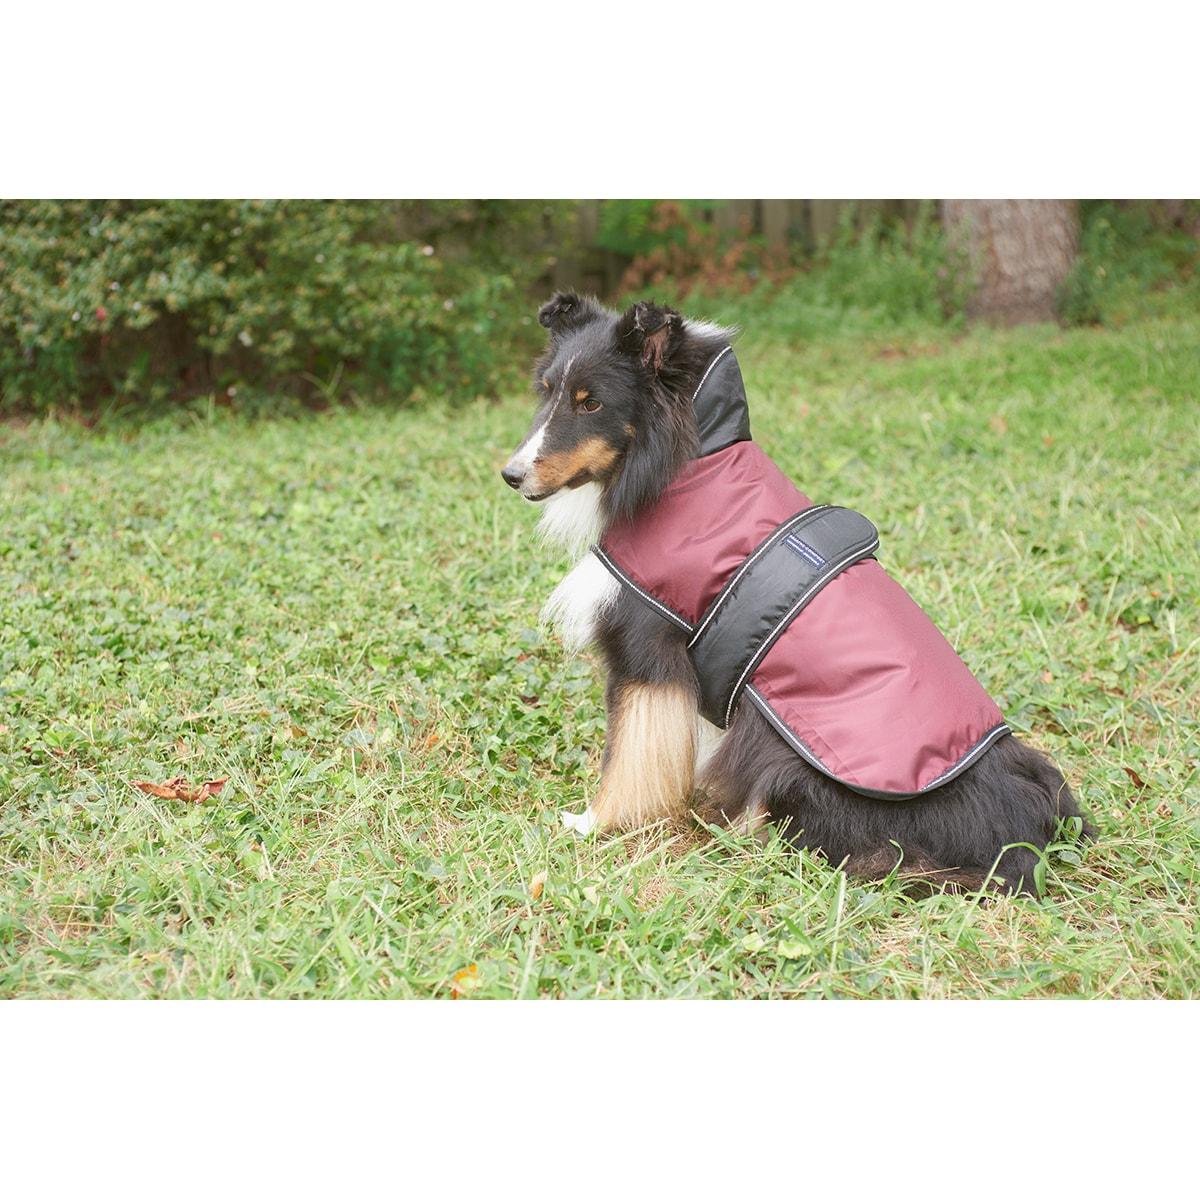 Ethical Pets Dog Artic Coat (Grey Large), Size L